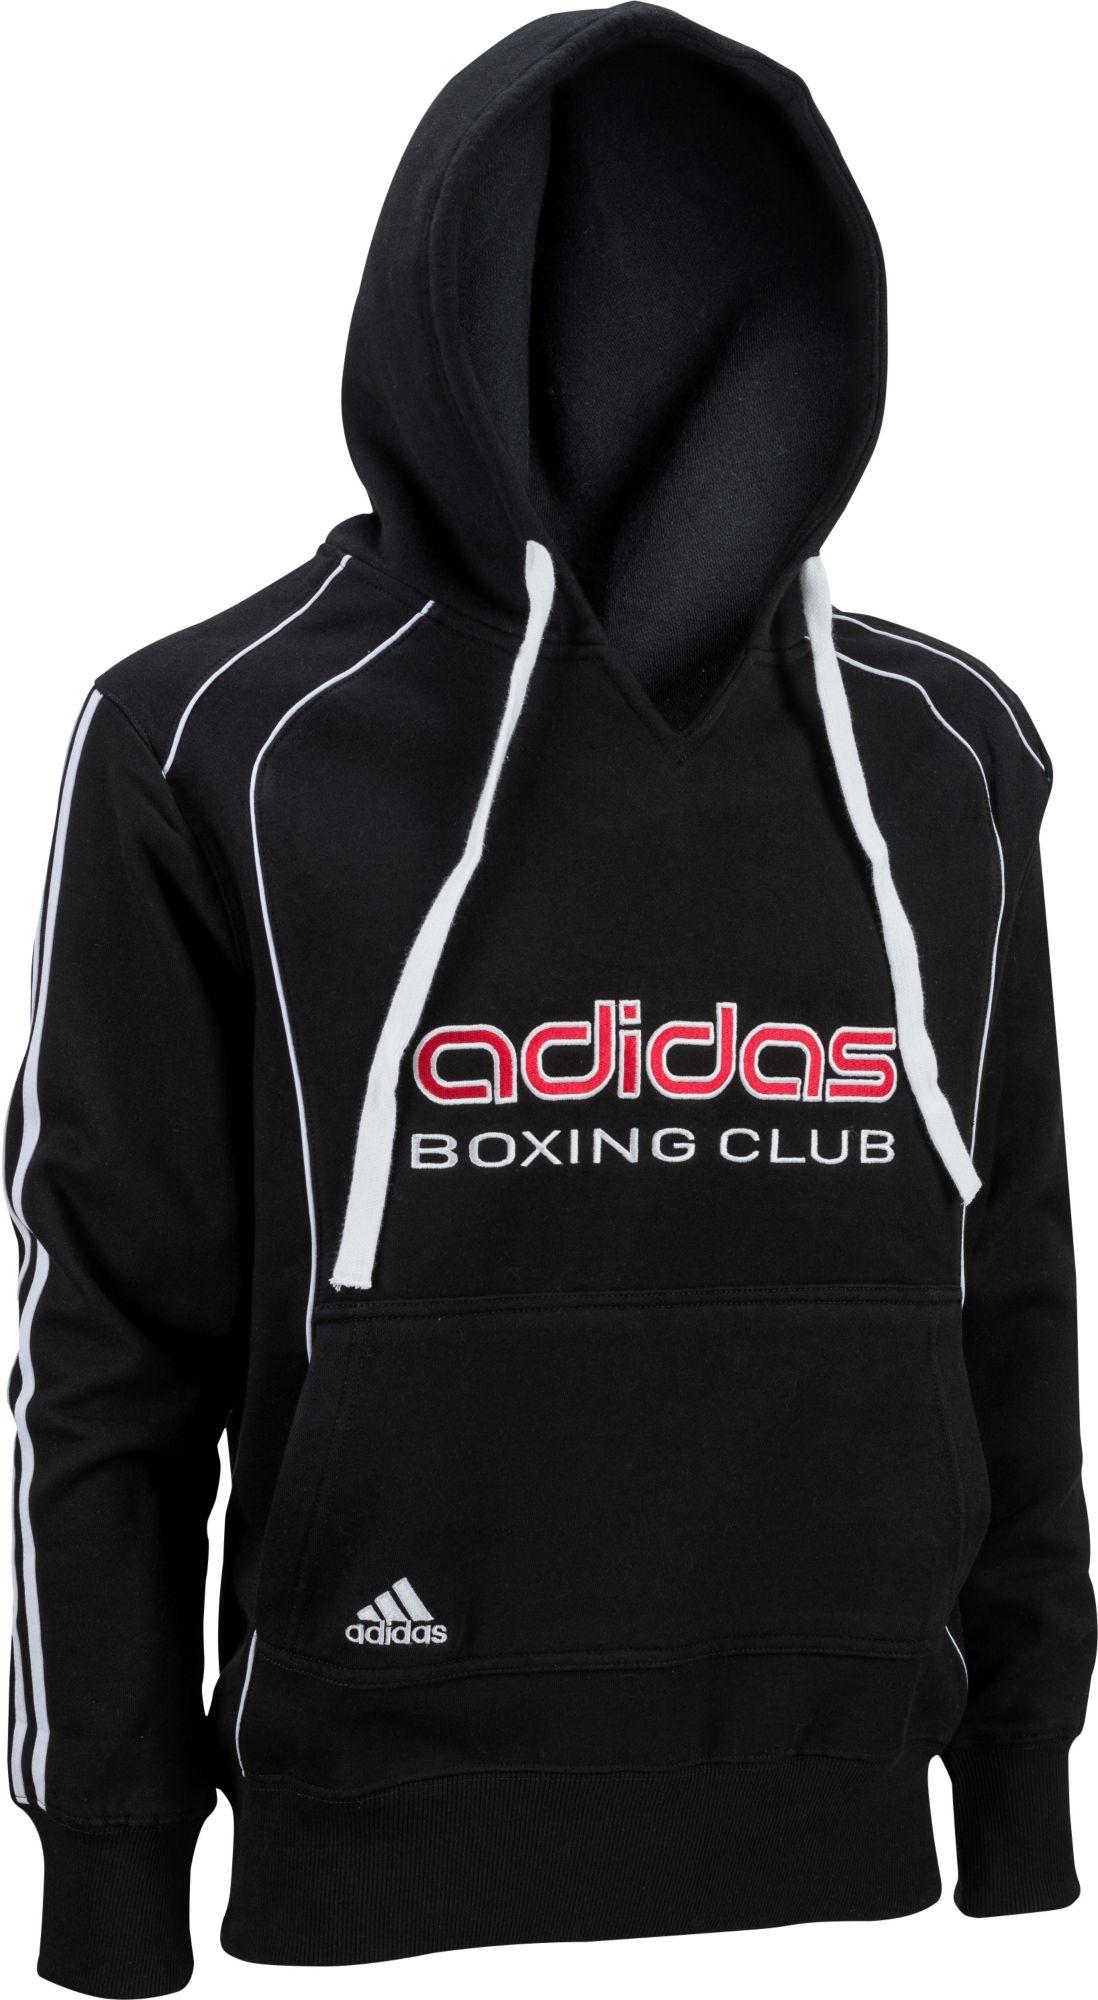 ADIDAS PERFORMANCE adidas Performance Kapuzensweatshirt, »Boxing Club«